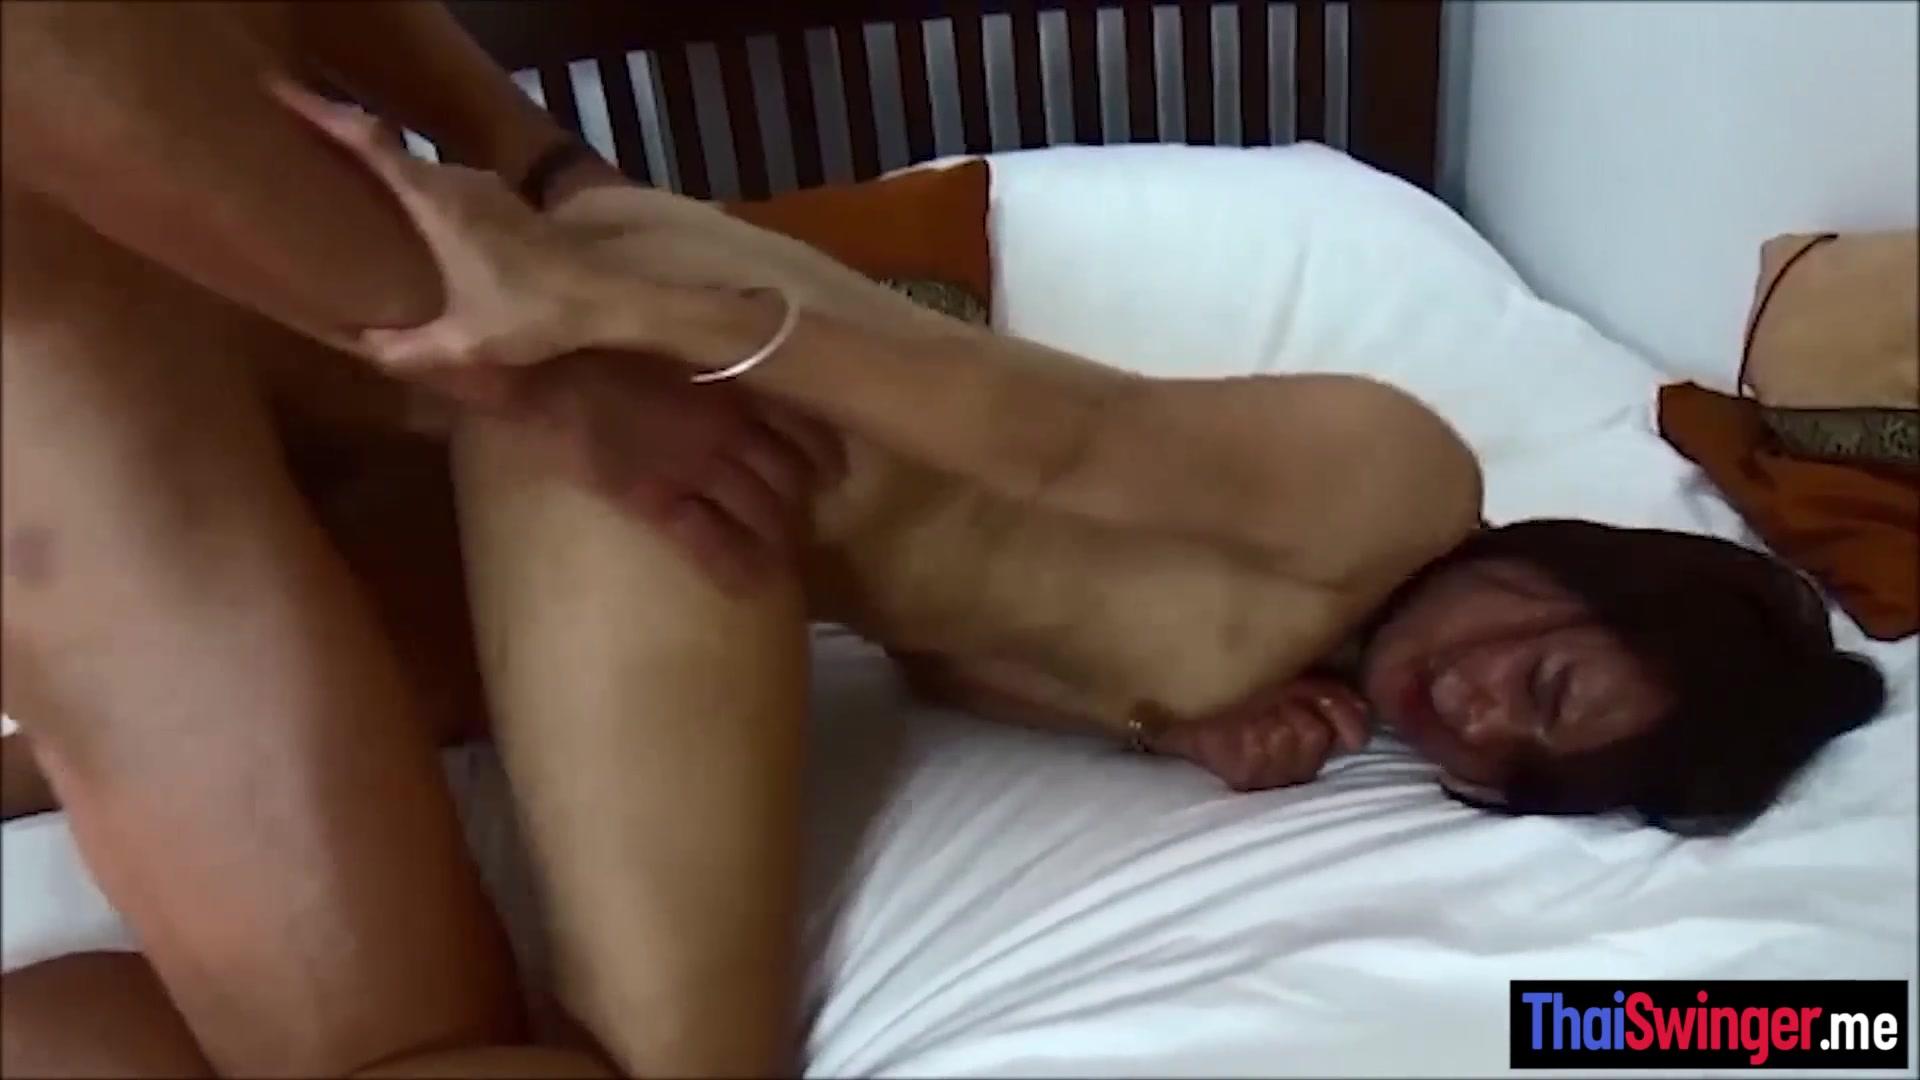 Lesbians Having Sex Strapon